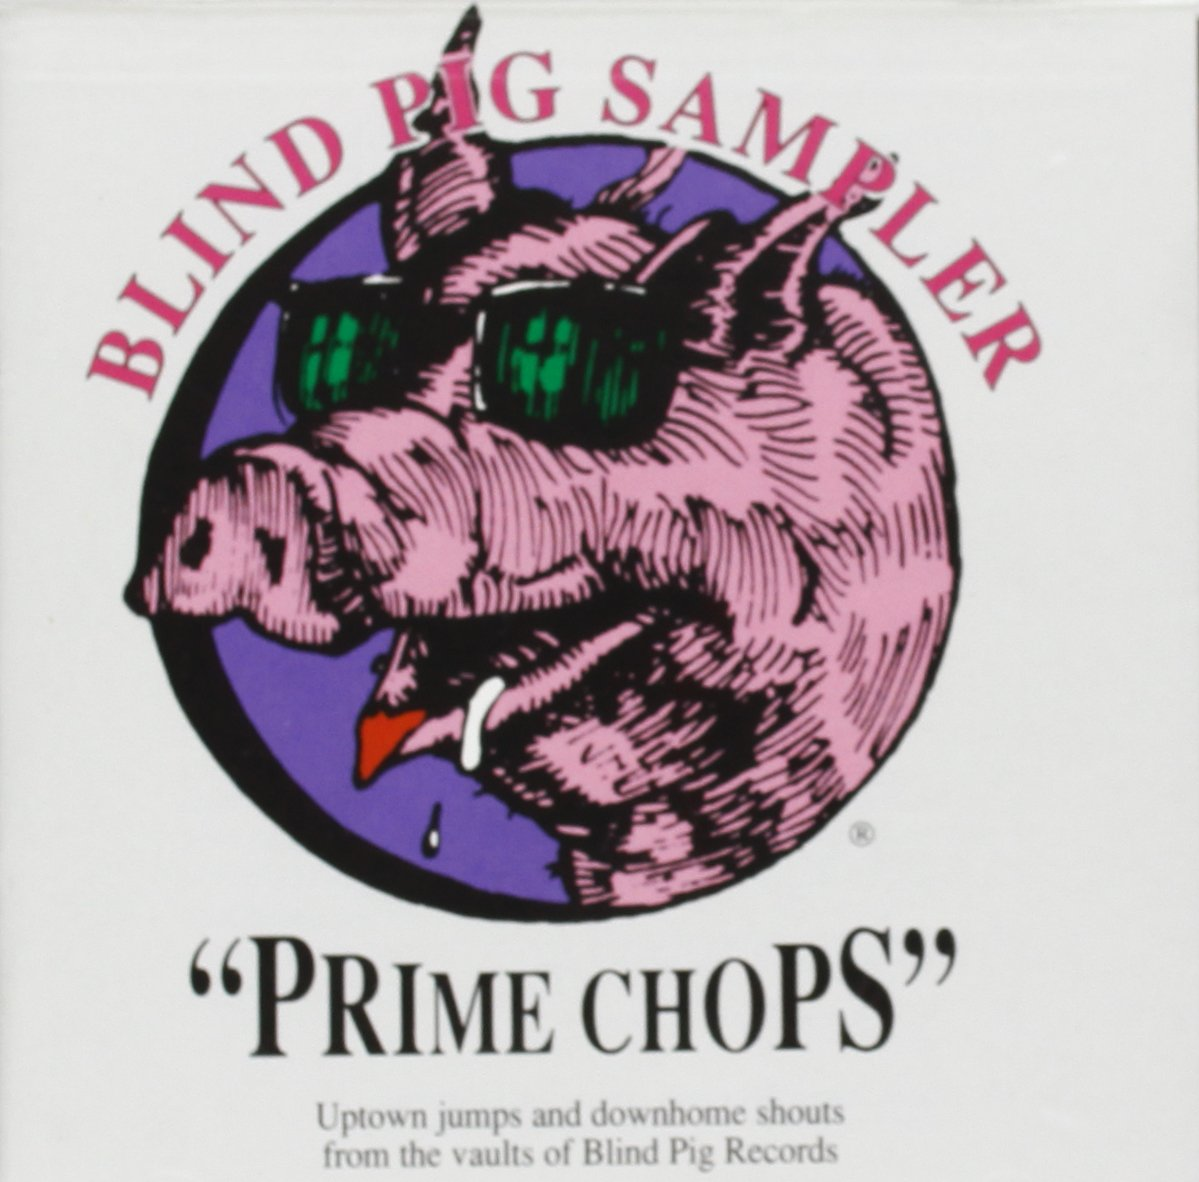 Prime Chops